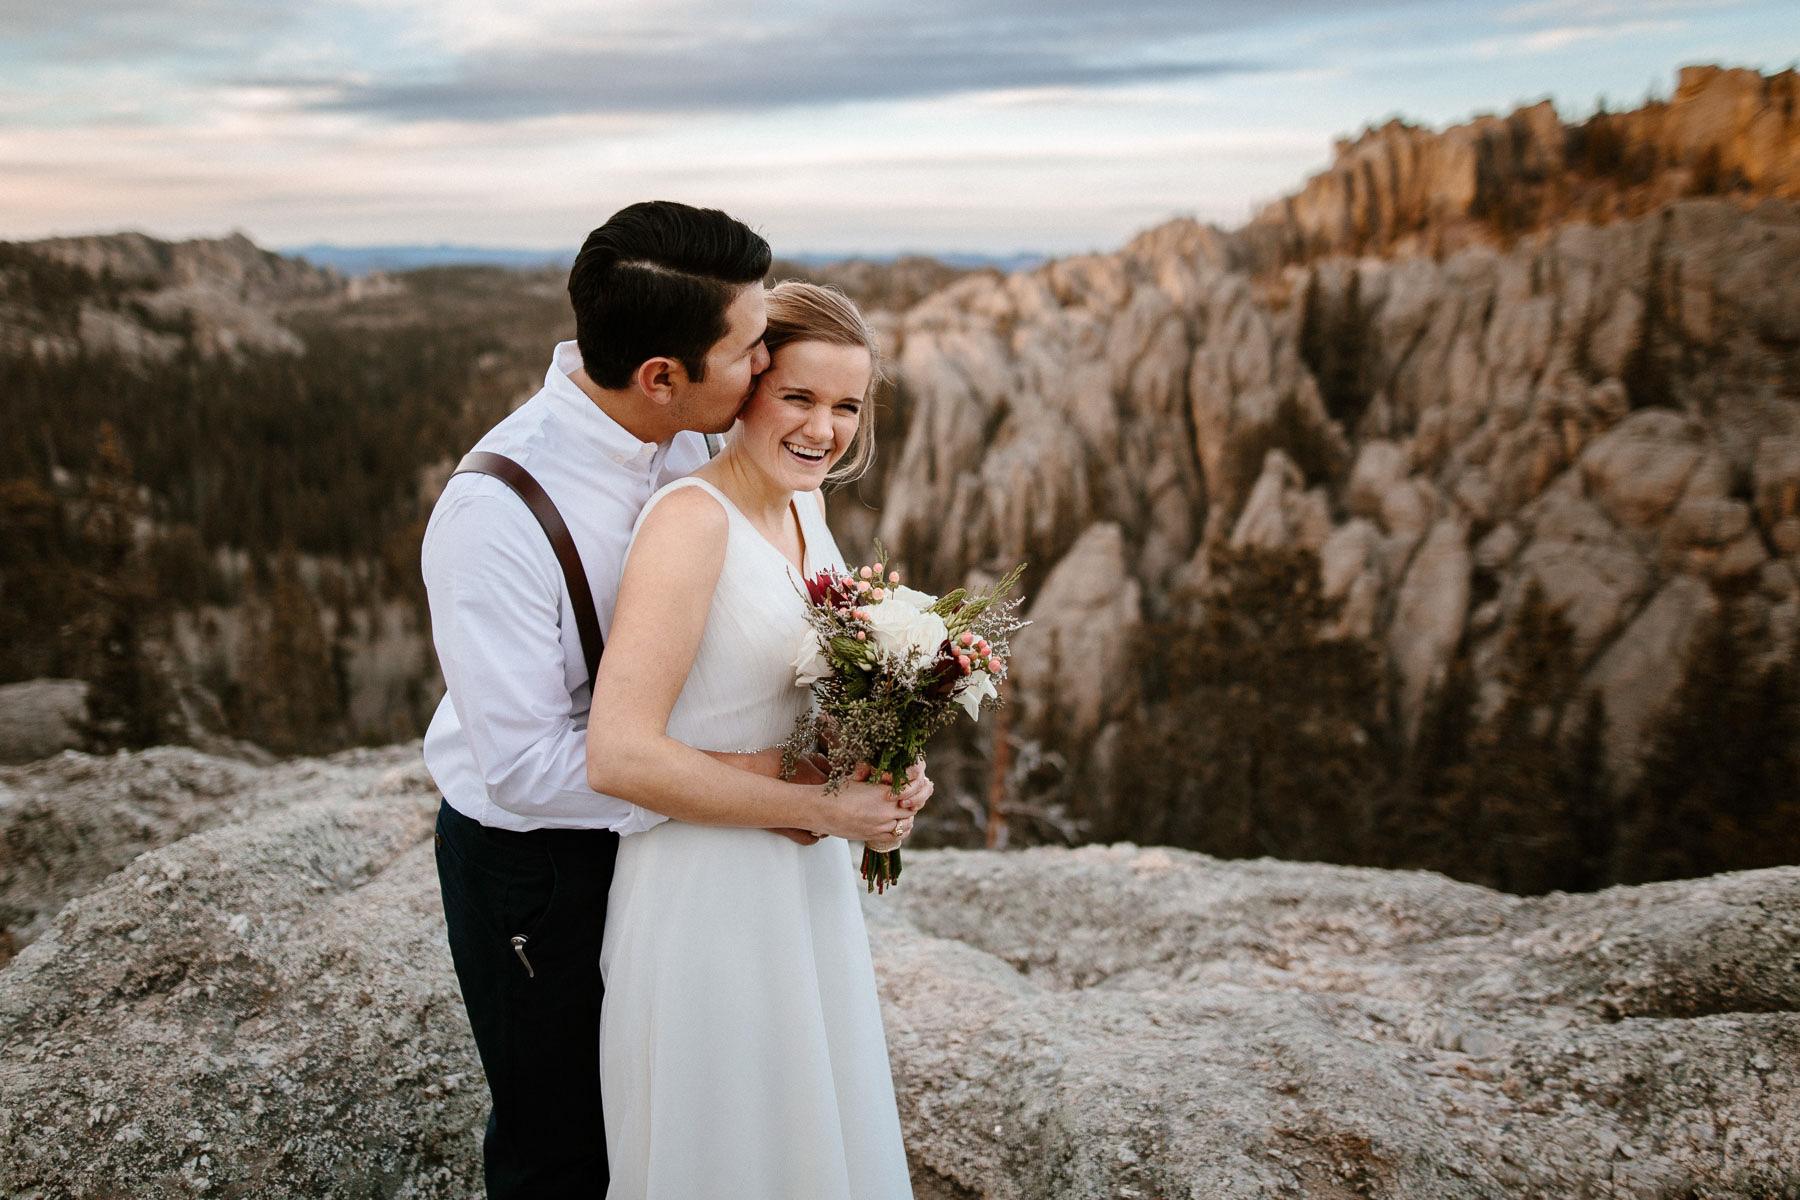 sioux-falls-black-hills-rapid-city-elopement-wedding-adventure-photographer-custer-sylvan-lake-50.jpg